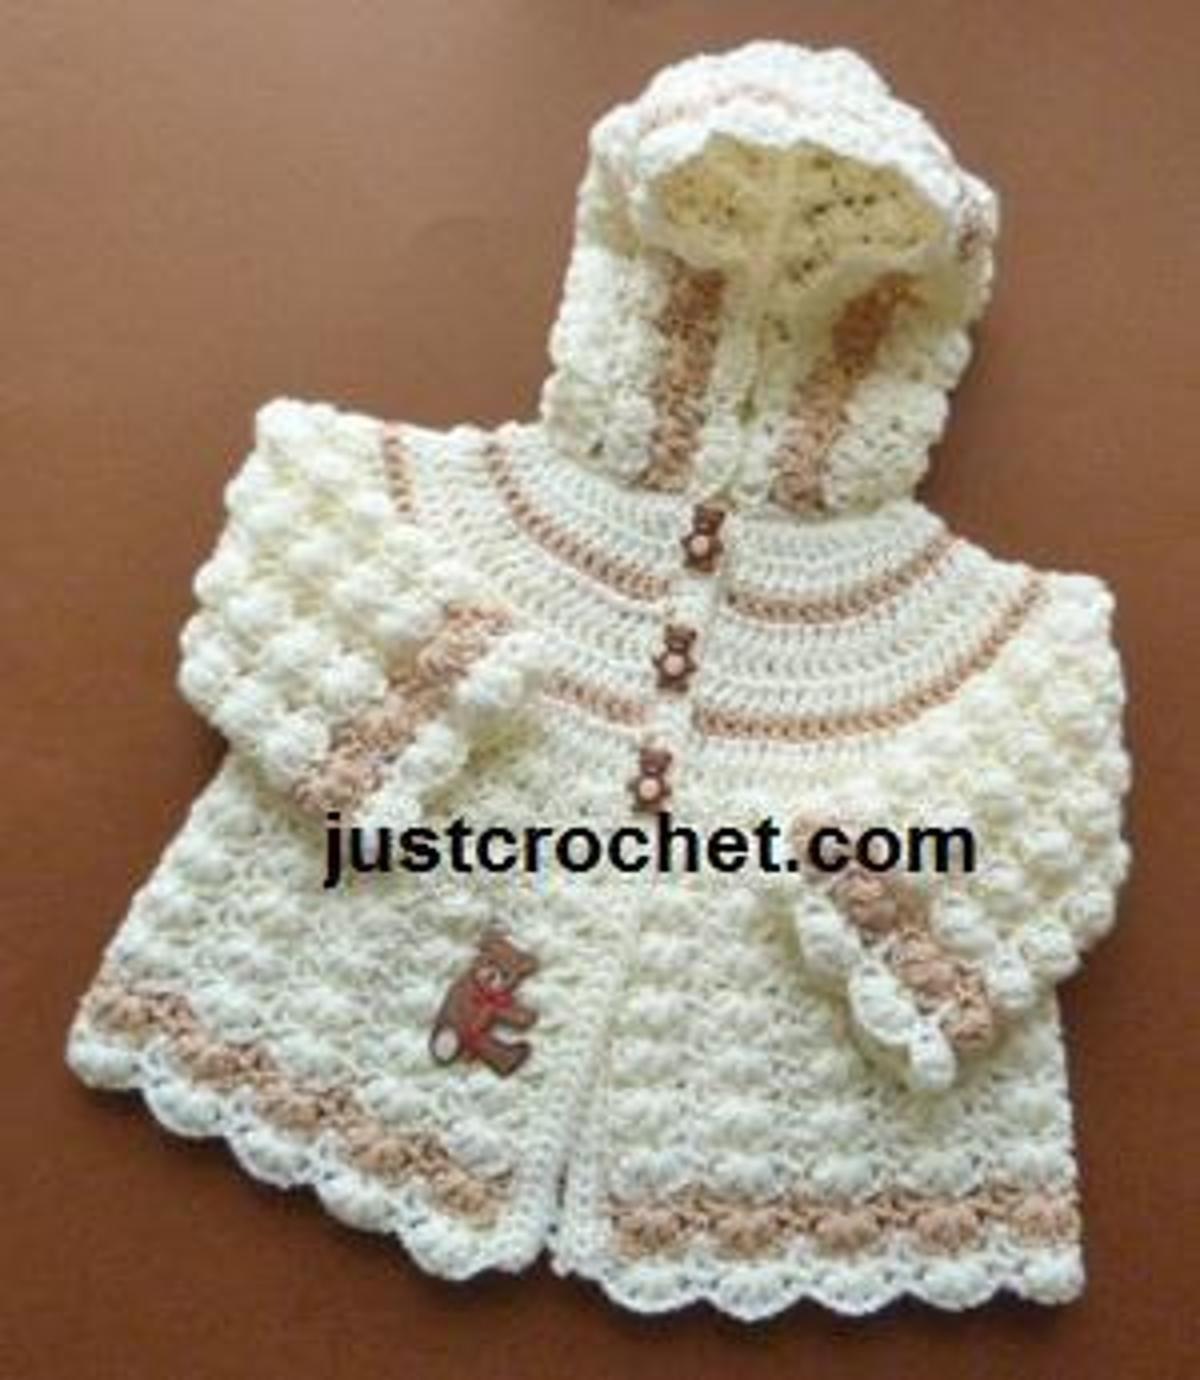 FJC99-Hooded Jacket baby crochet pattern | Craftsy | Crochet - Kids ...